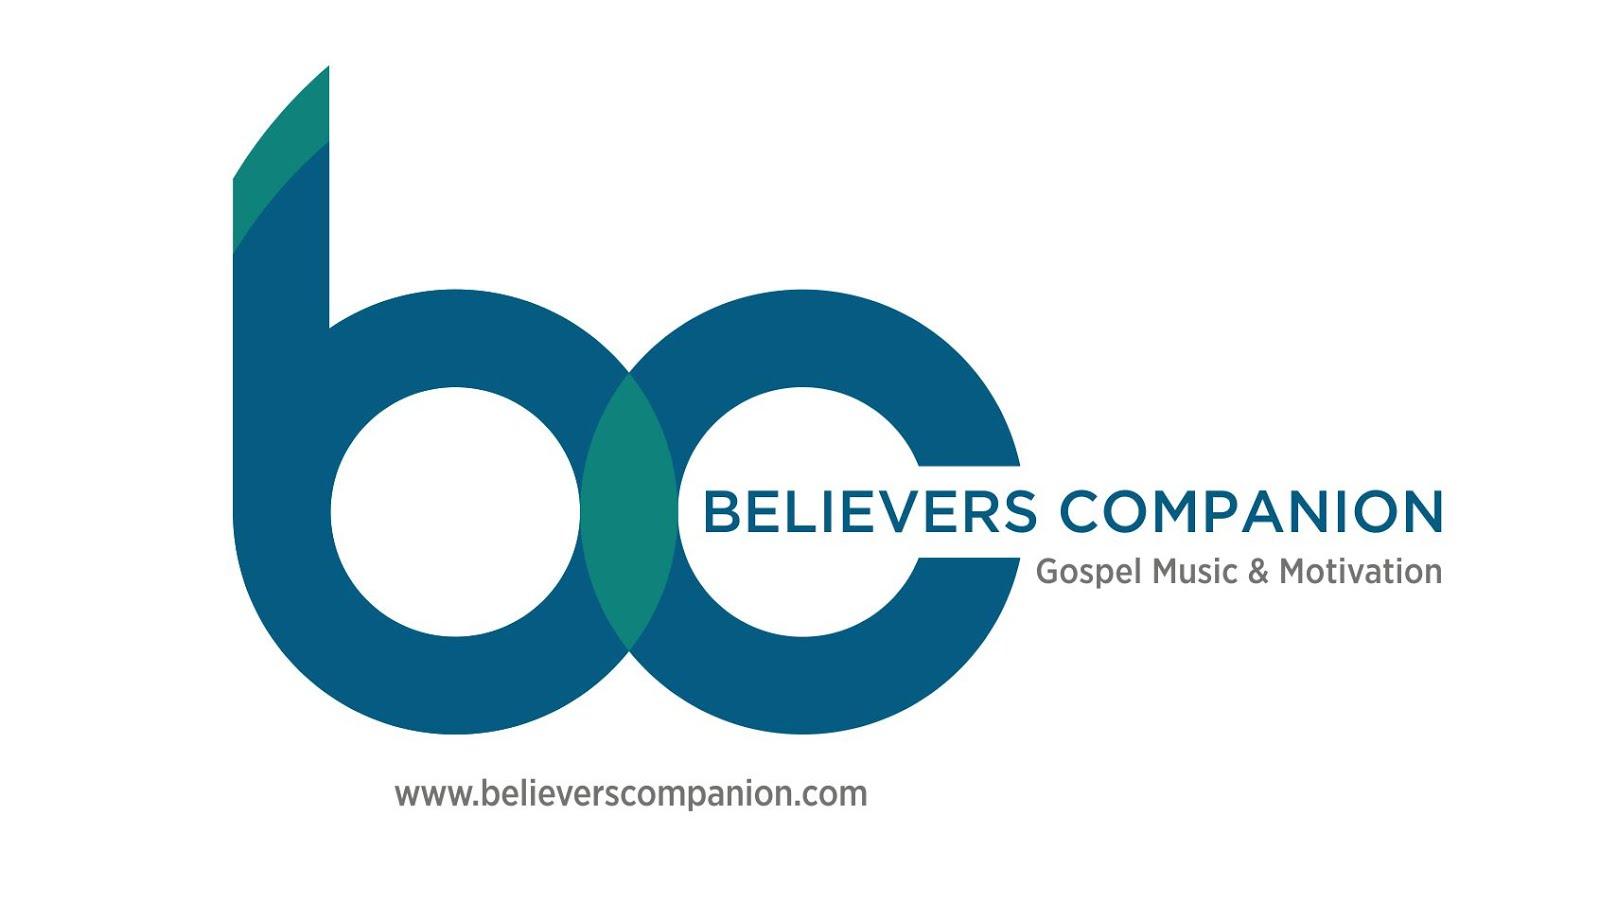 Believers Companion